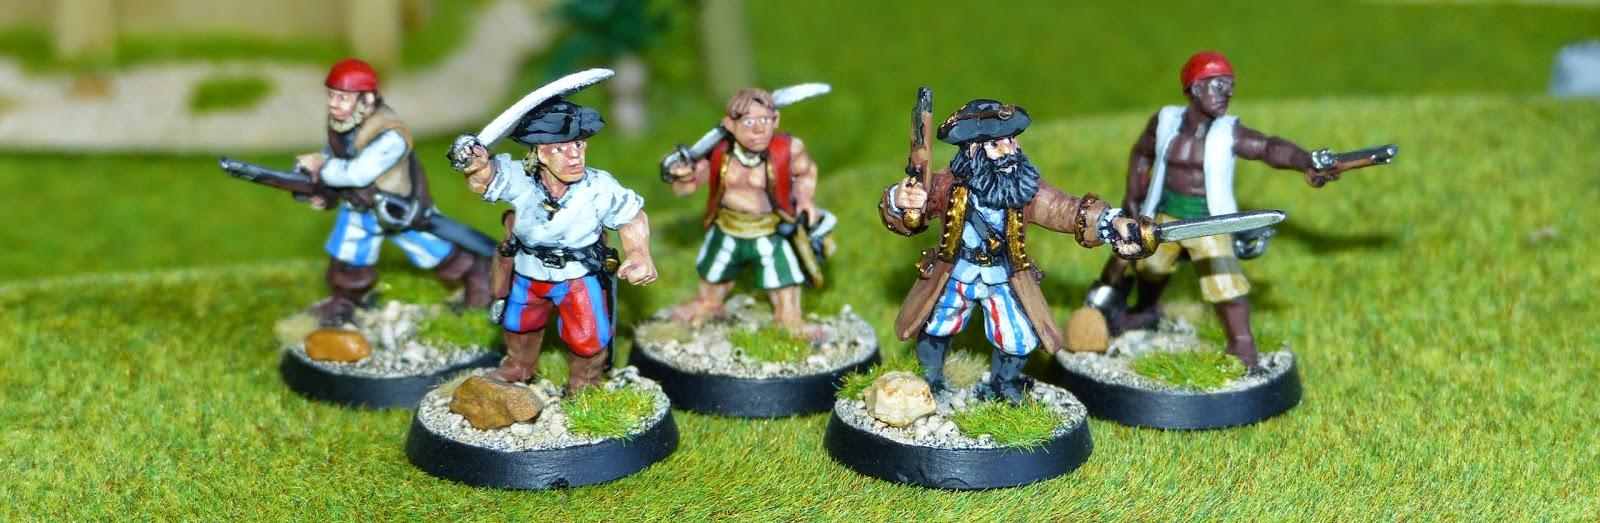 Mes Pirates Team-Capitaine-Calico-Richard